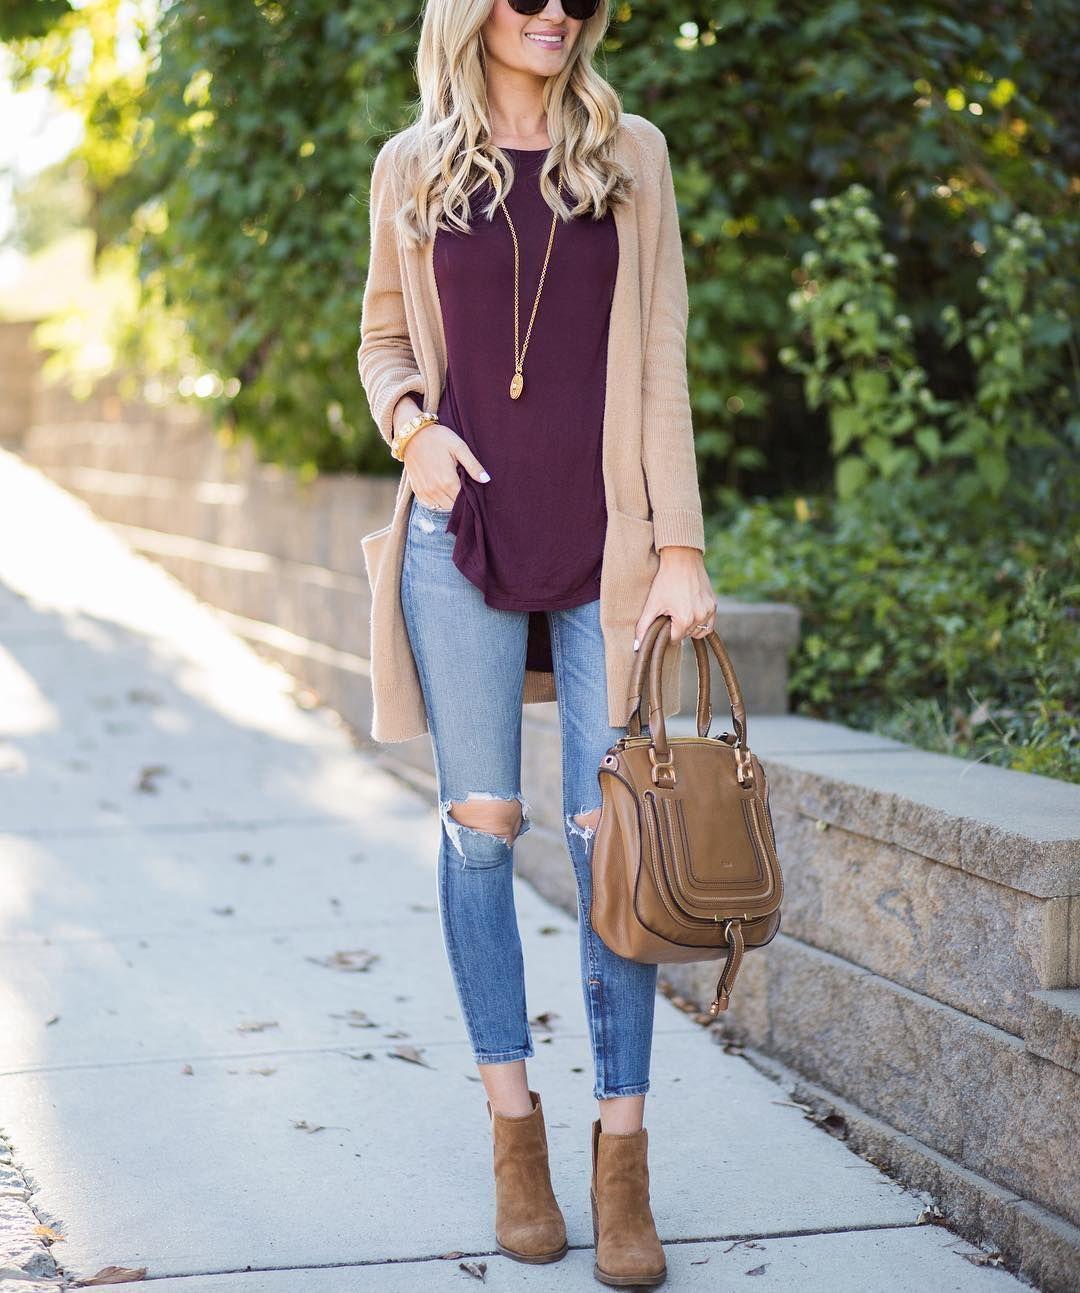 Color maravilloso moda Jeans Blusa vino Cardigan beige Botines   Fashion 2016   Pinterest ...